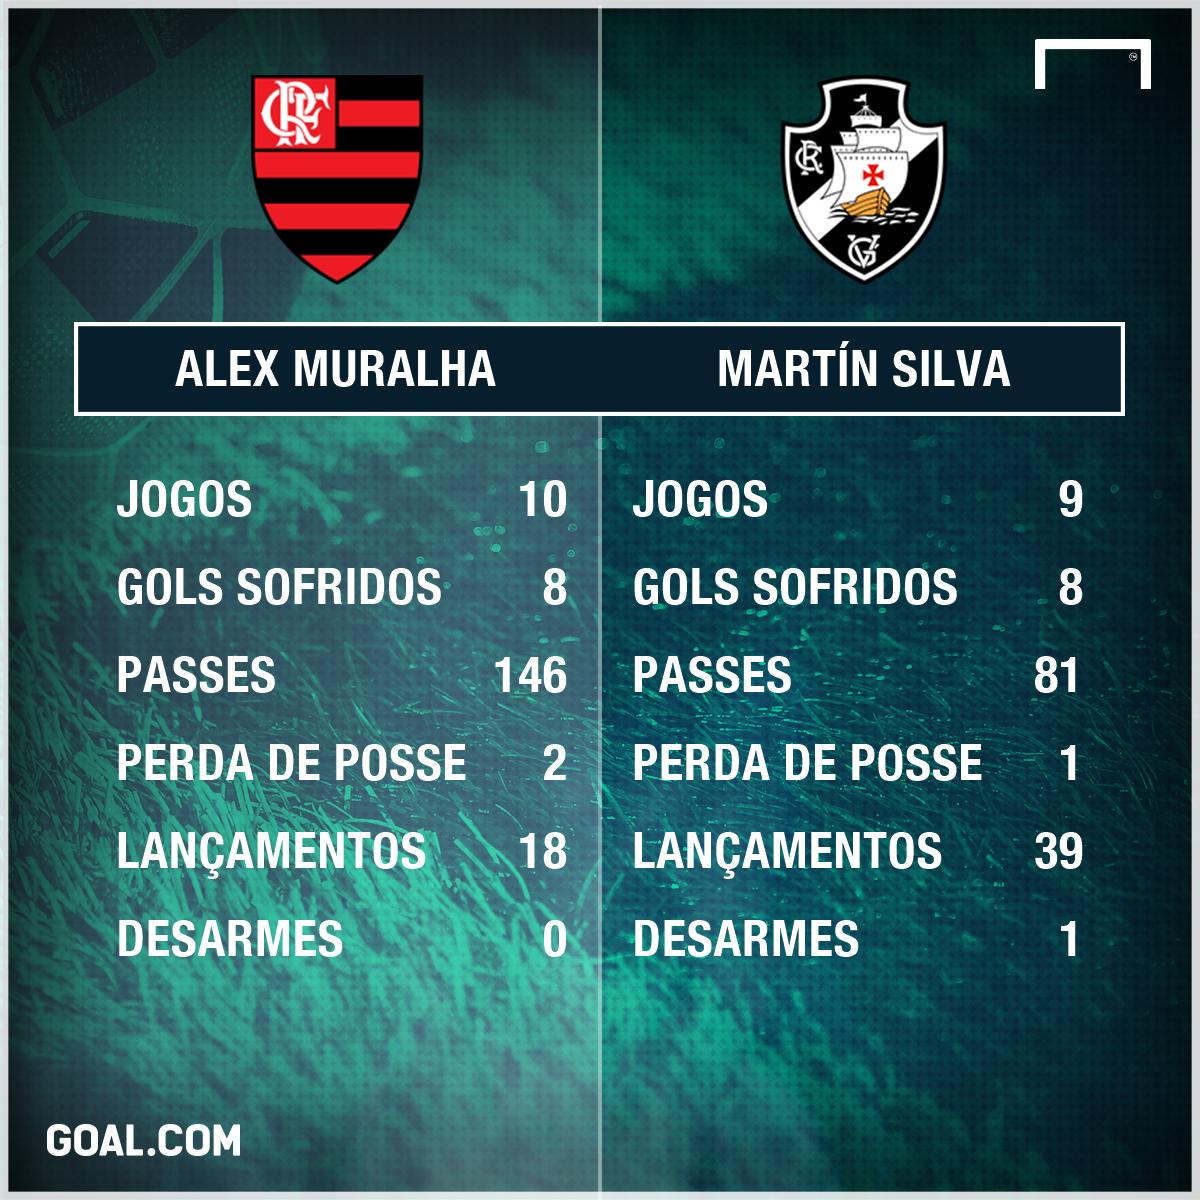 GFX Alex Muralha x Martín Silva